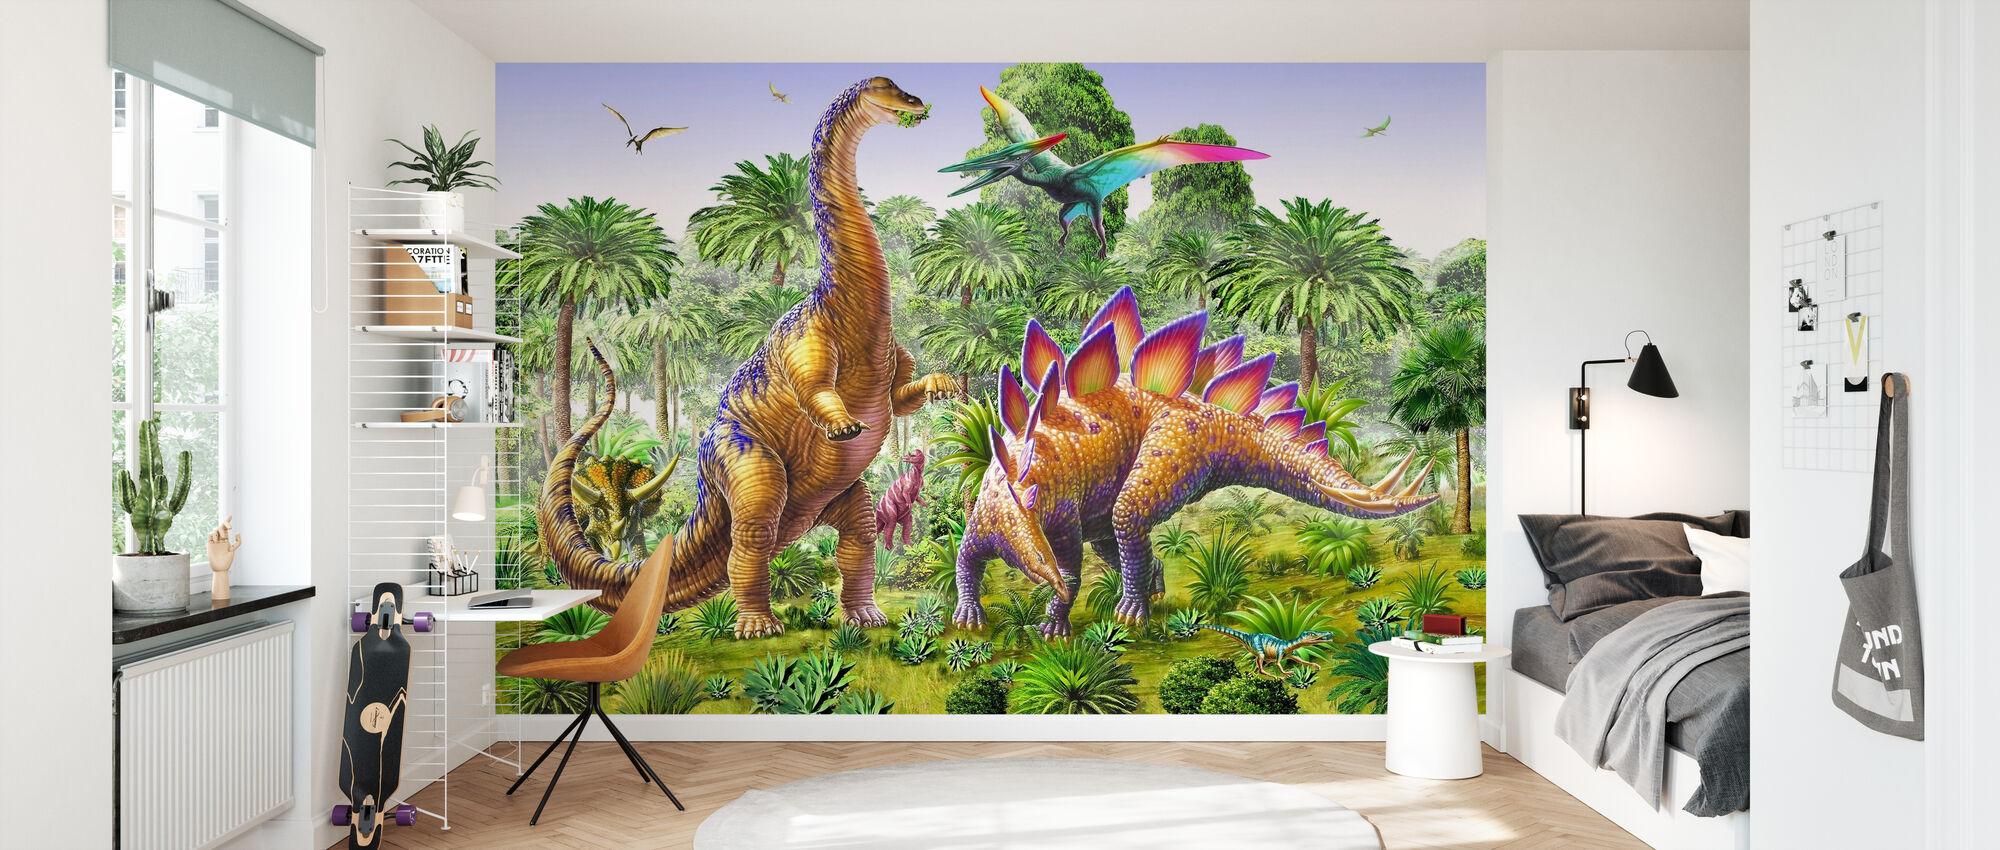 Brachiosaur and Stegasaur - Wallpaper - Kids Room